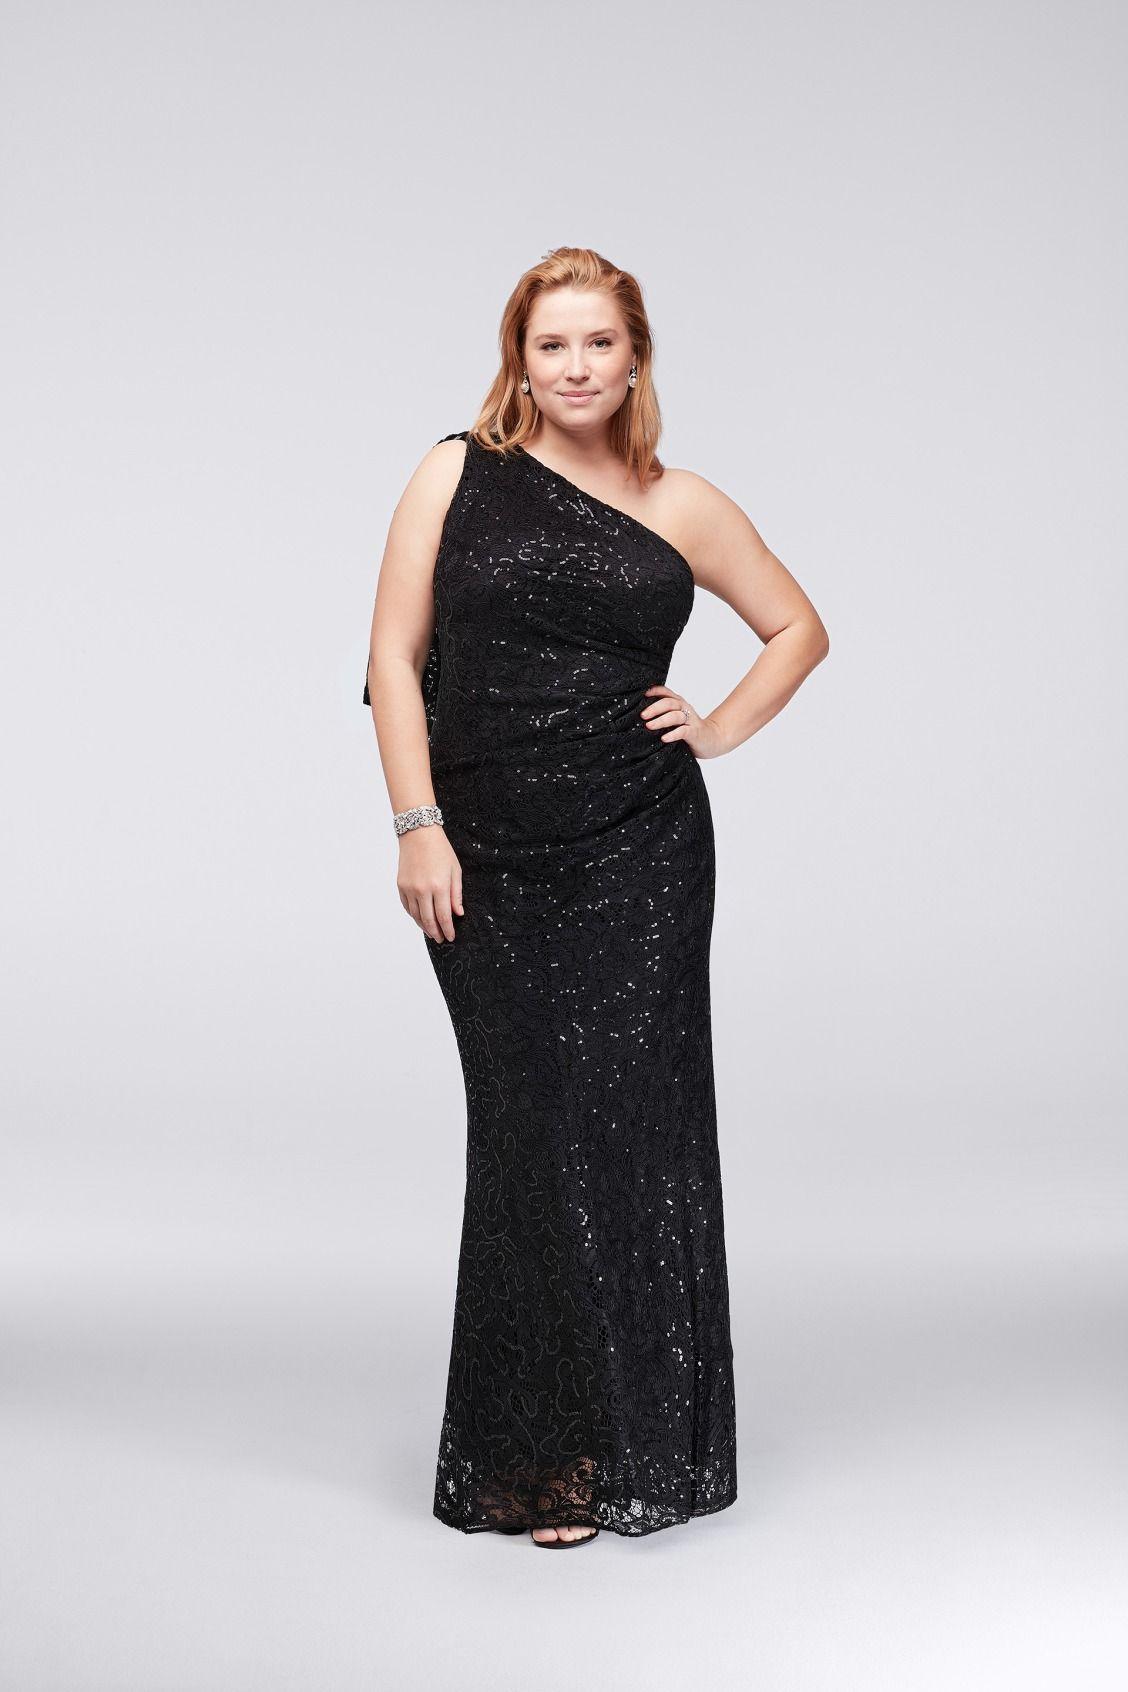 One-Shoulder Sequin Lace Plus Size Mother of the Bride Dress ...